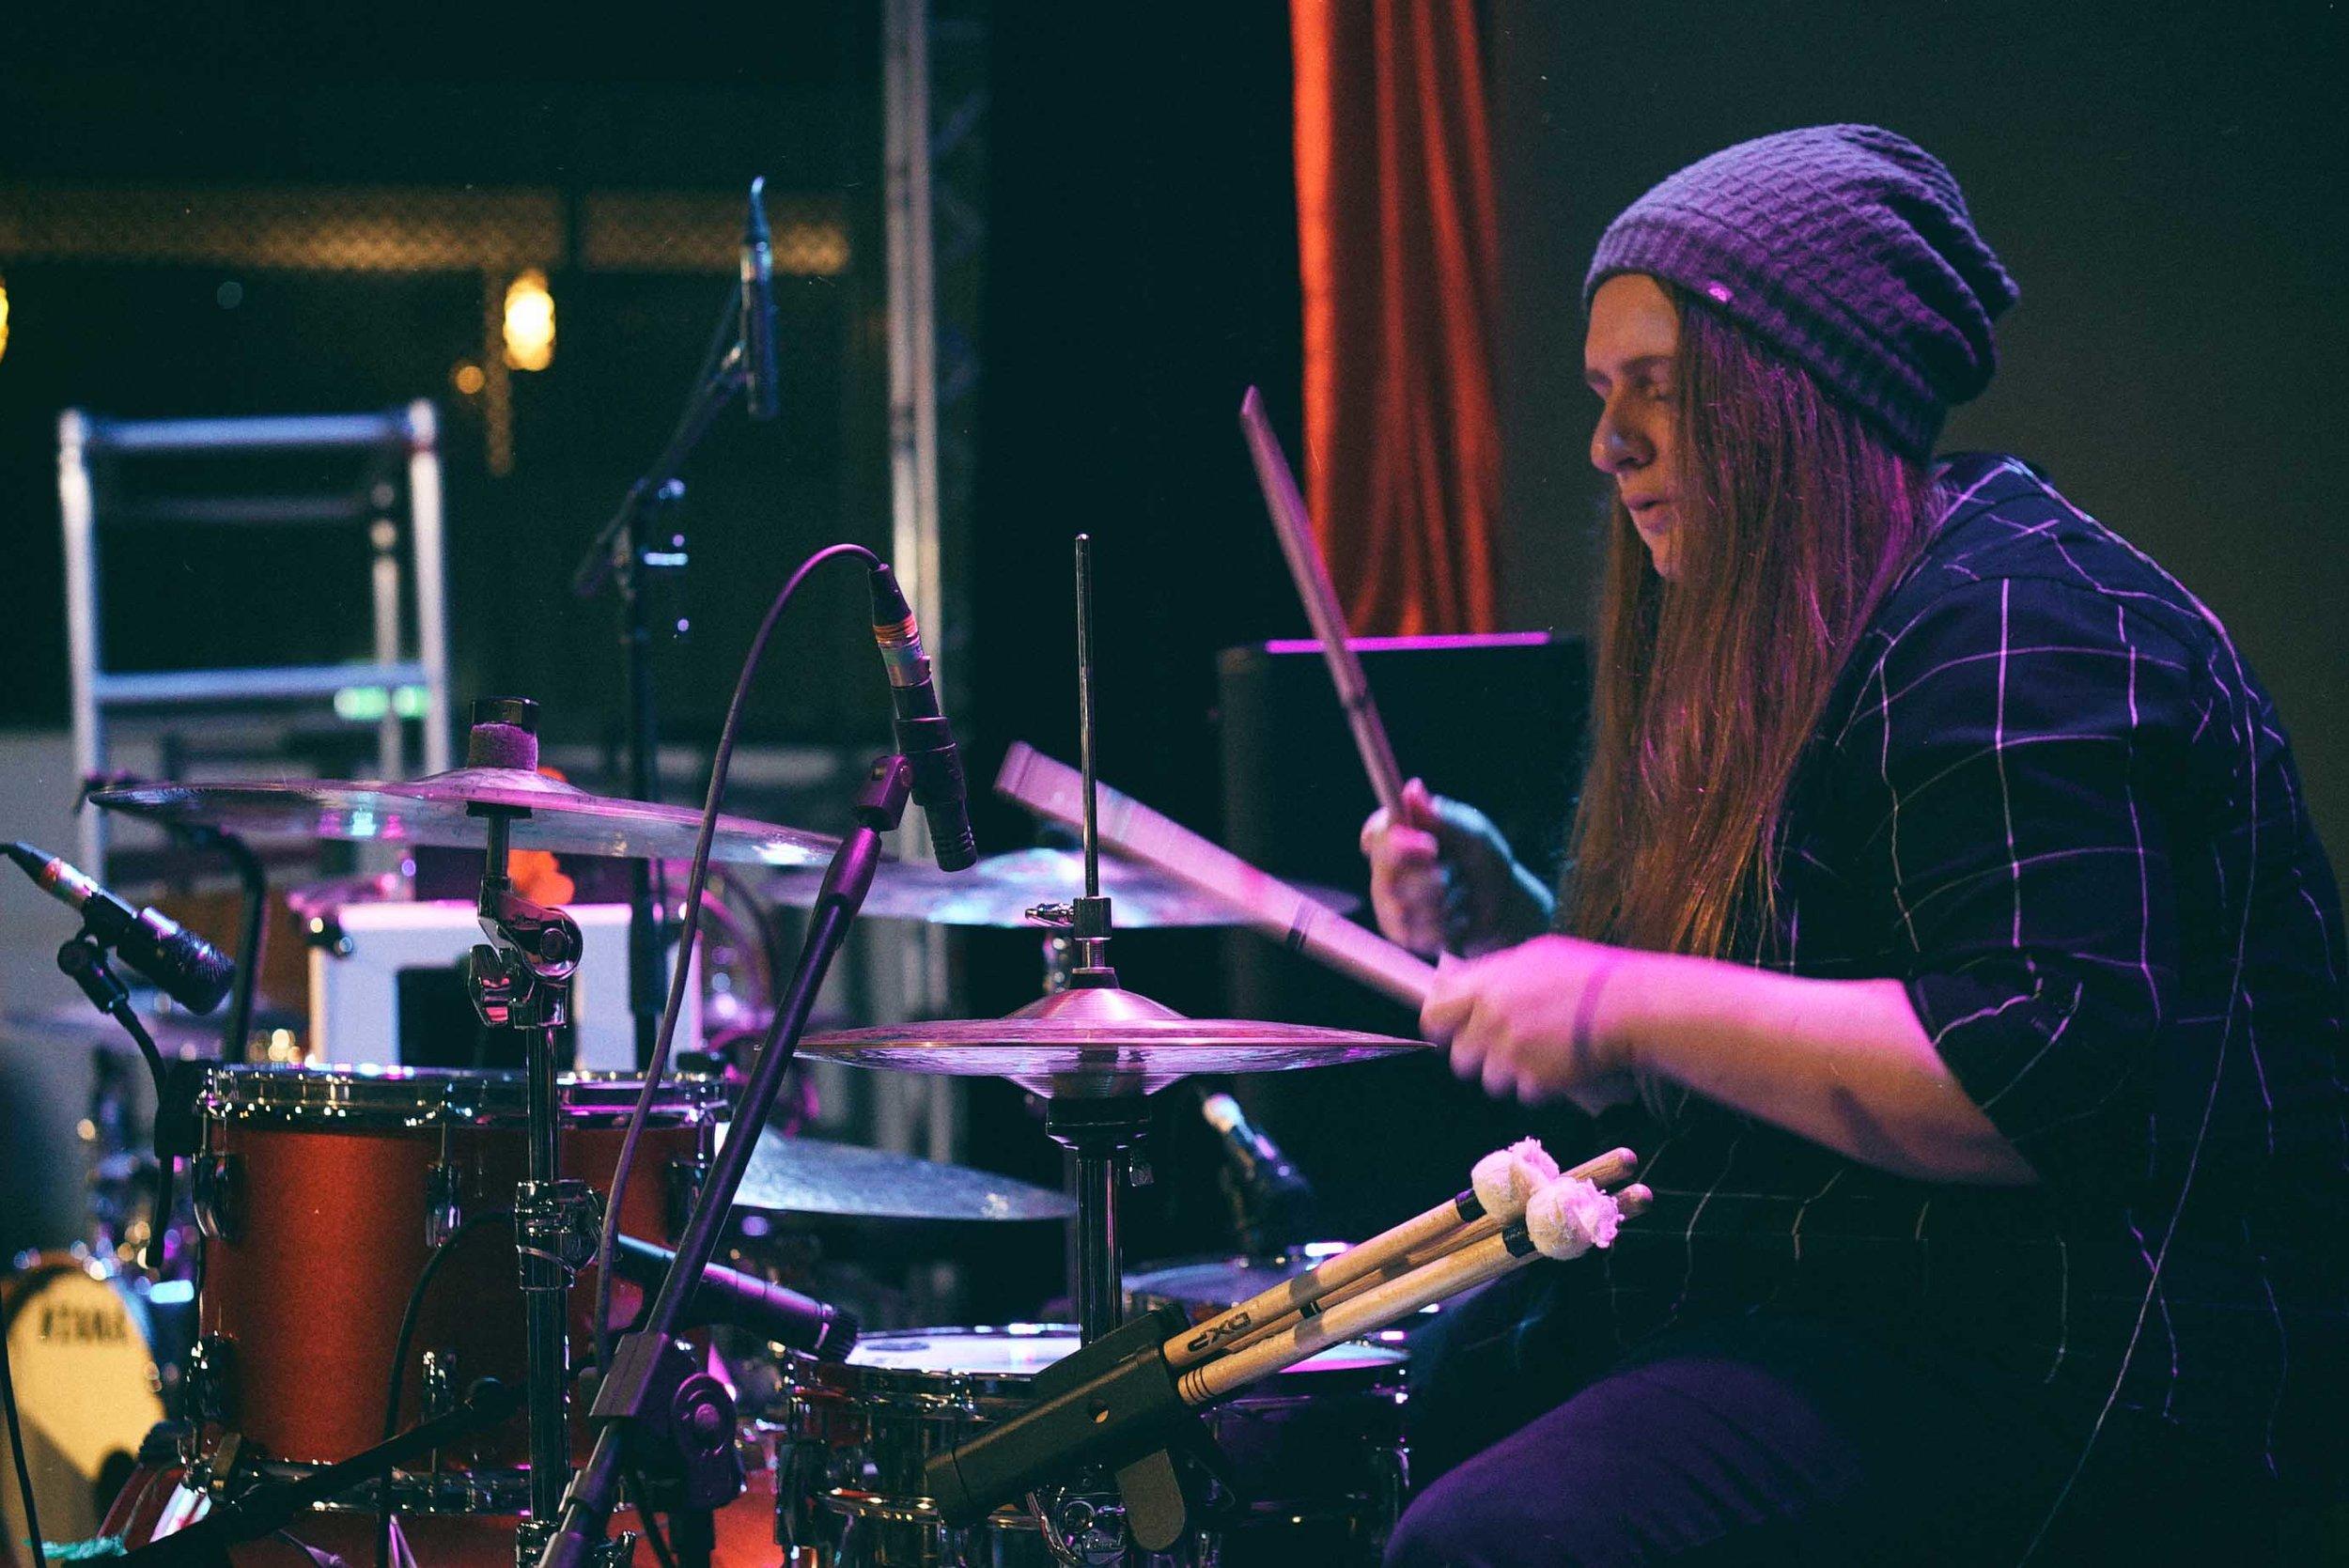 Tiarni Nichols performing with Athena Joy at NightQuarter 2018